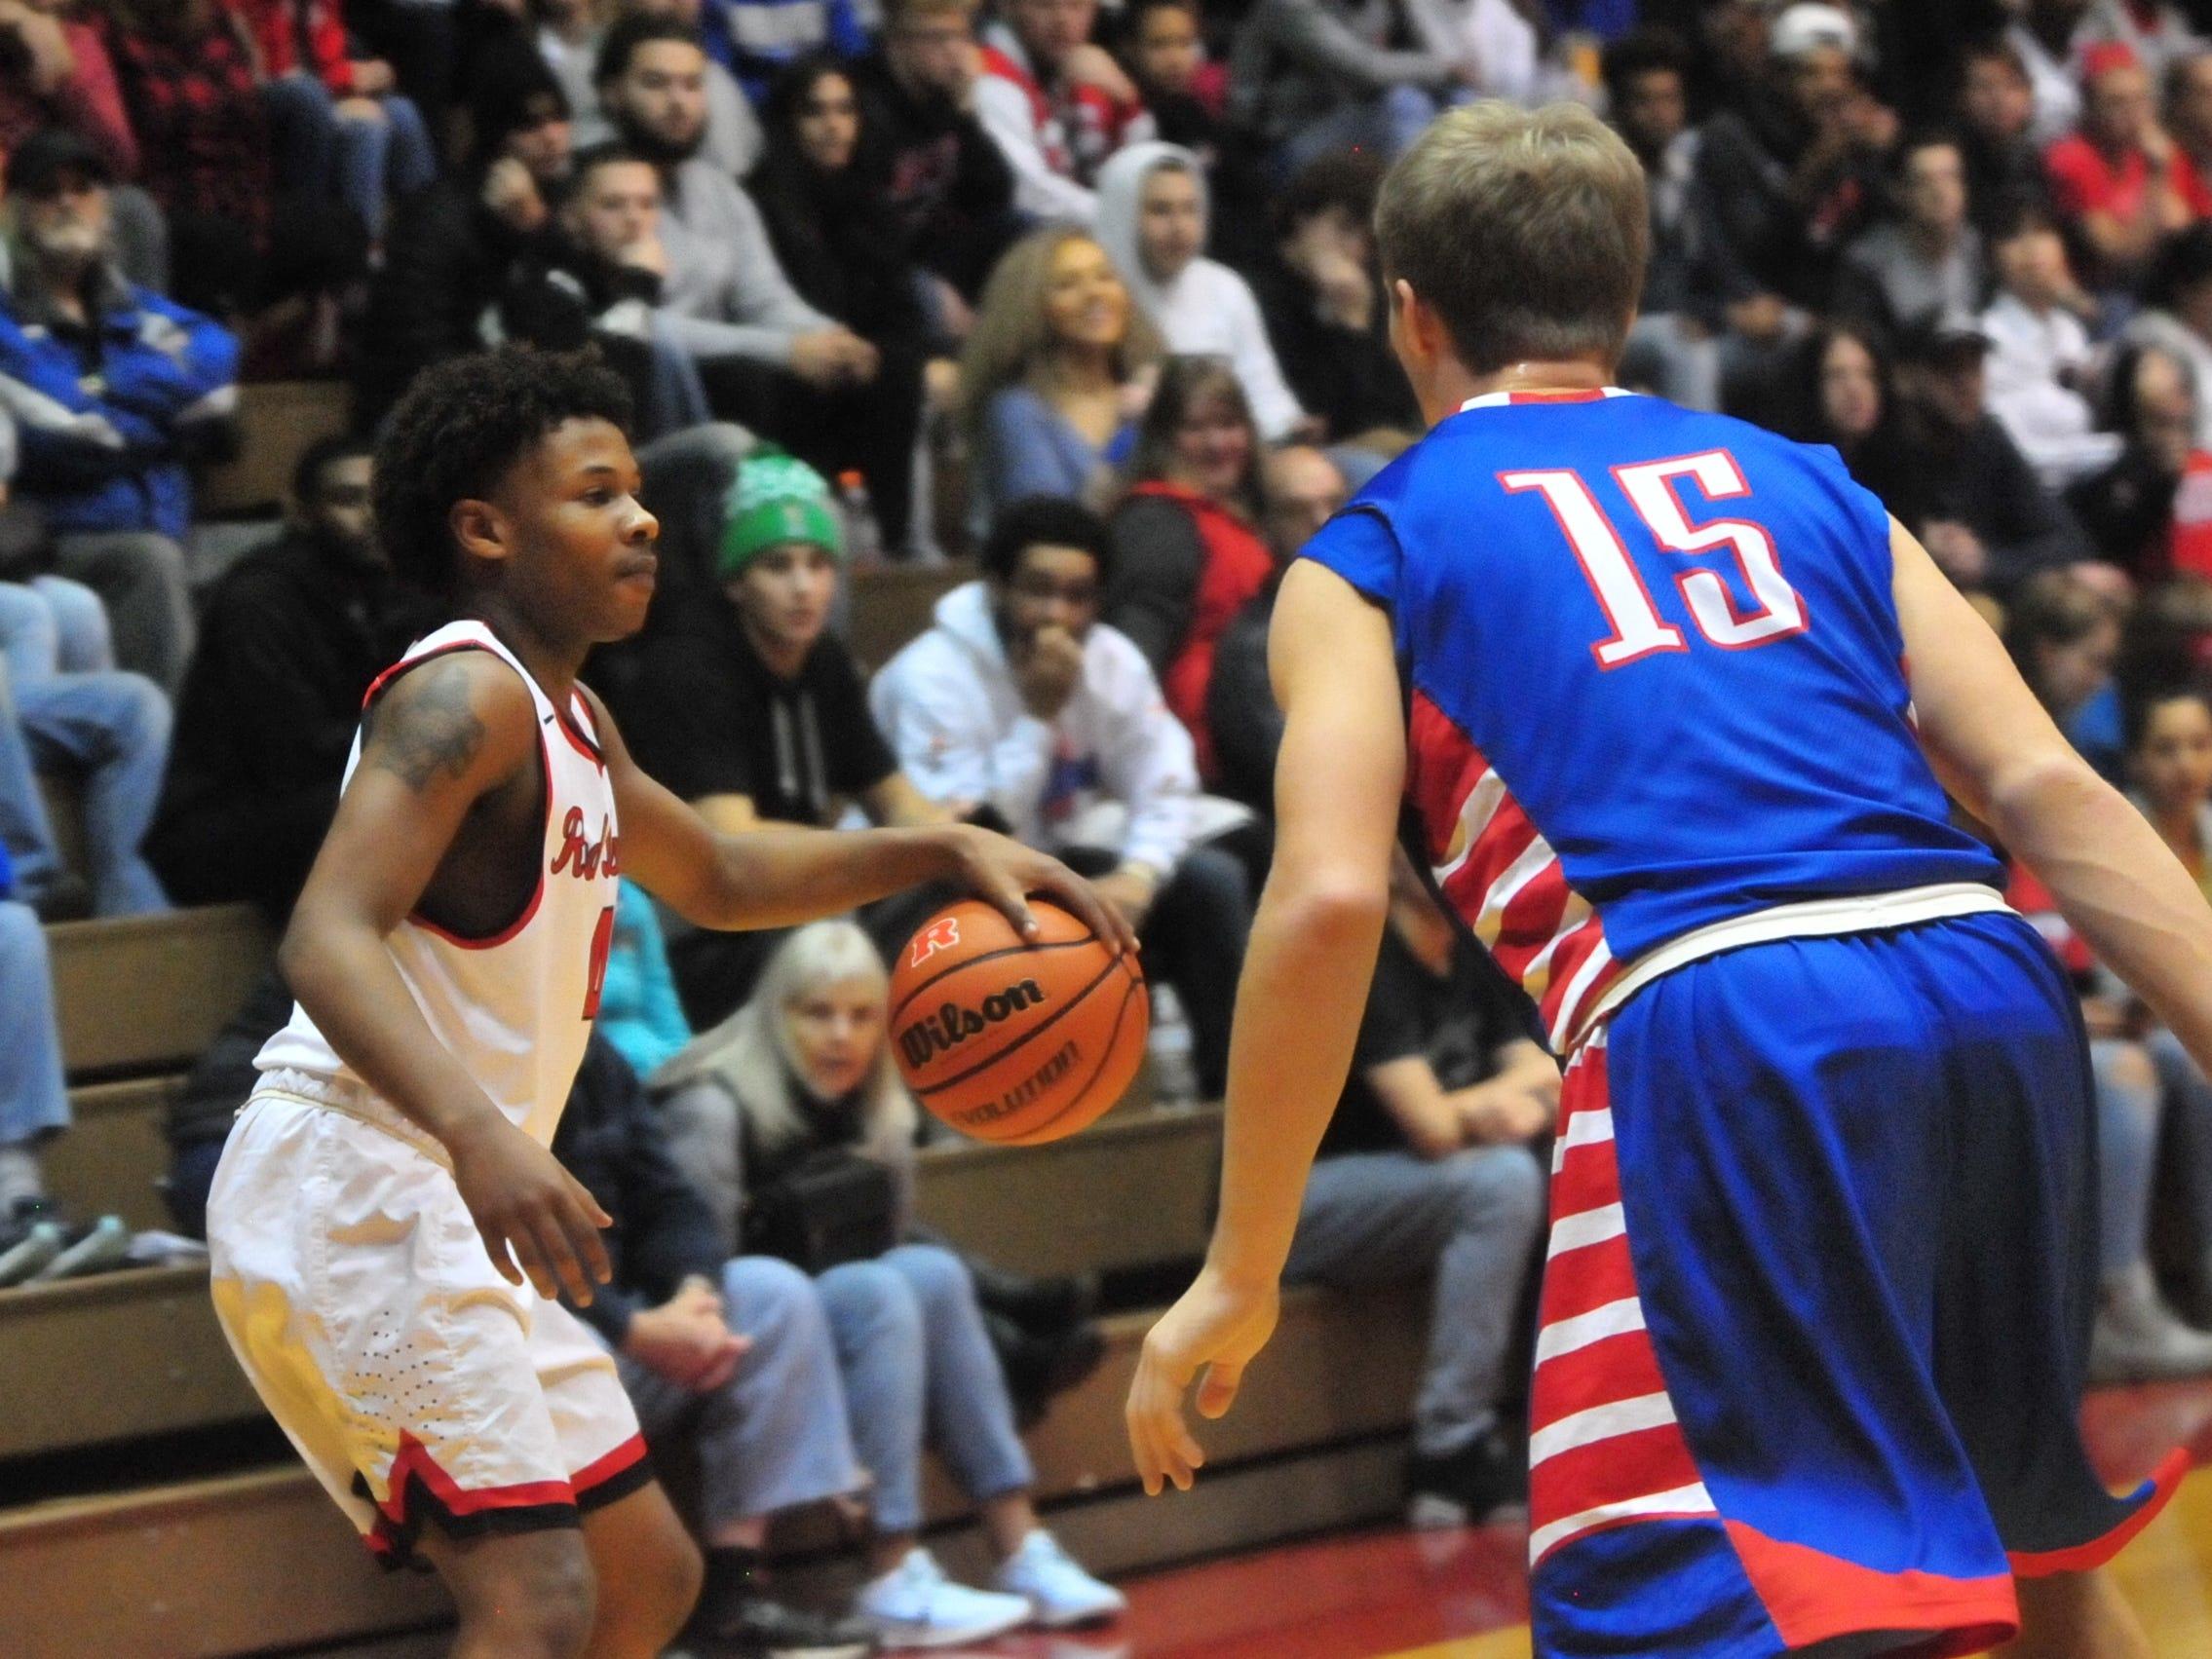 Richmond High School junior Koream Jett (4) moves the ball during a boys basketball game against Jay County Saturday, Nov. 24, 2018 at Richmond High School's Tiernan Center.